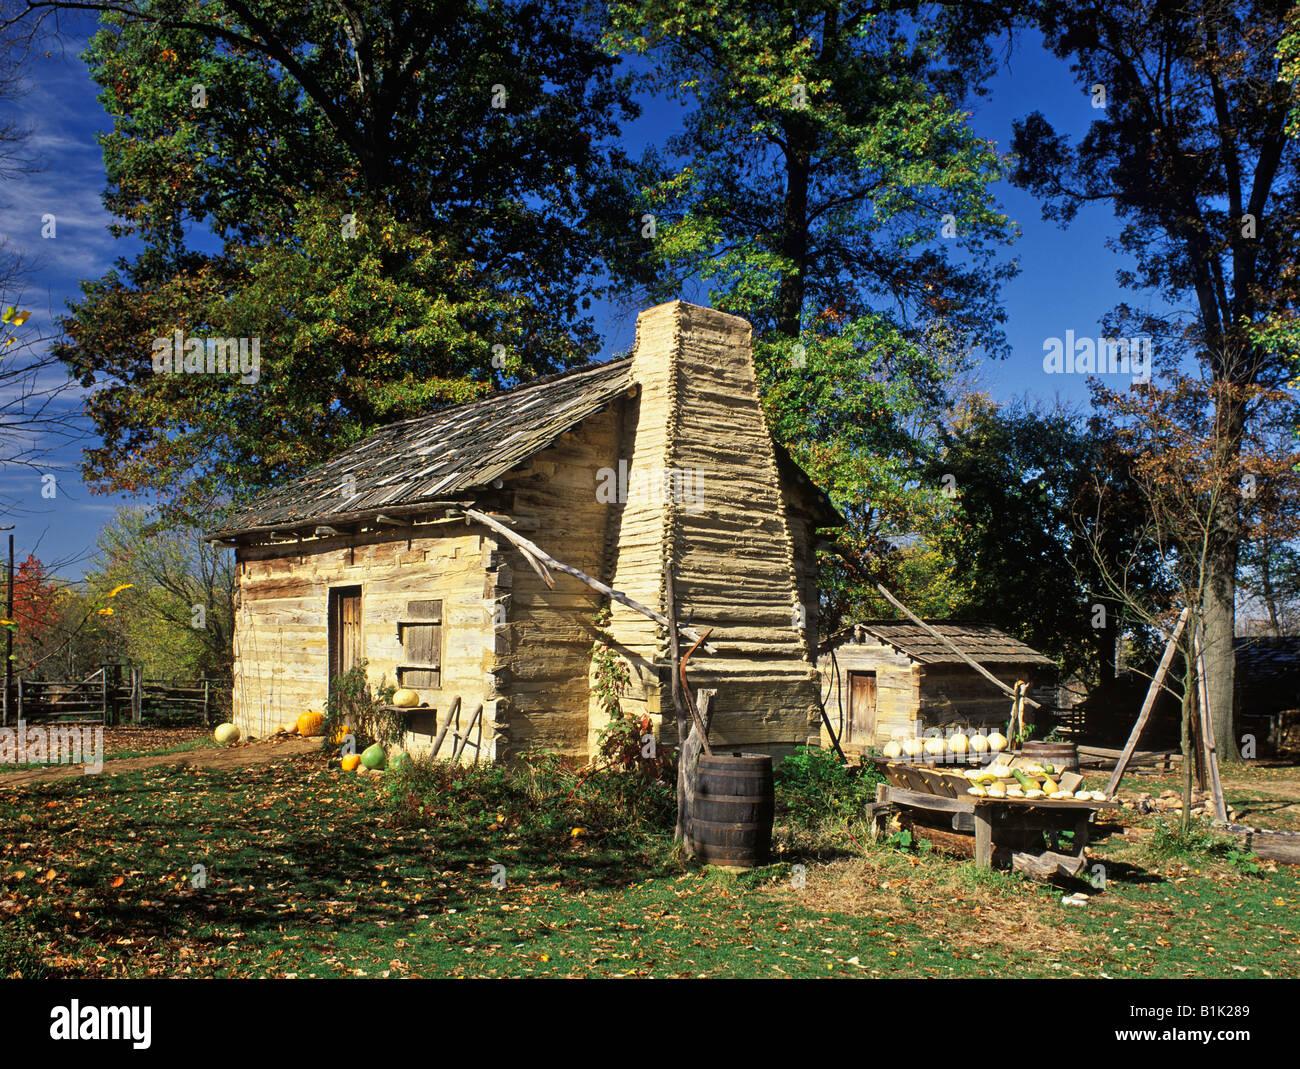 log cabin depicting abraham lincoln s boyhood home spencer county